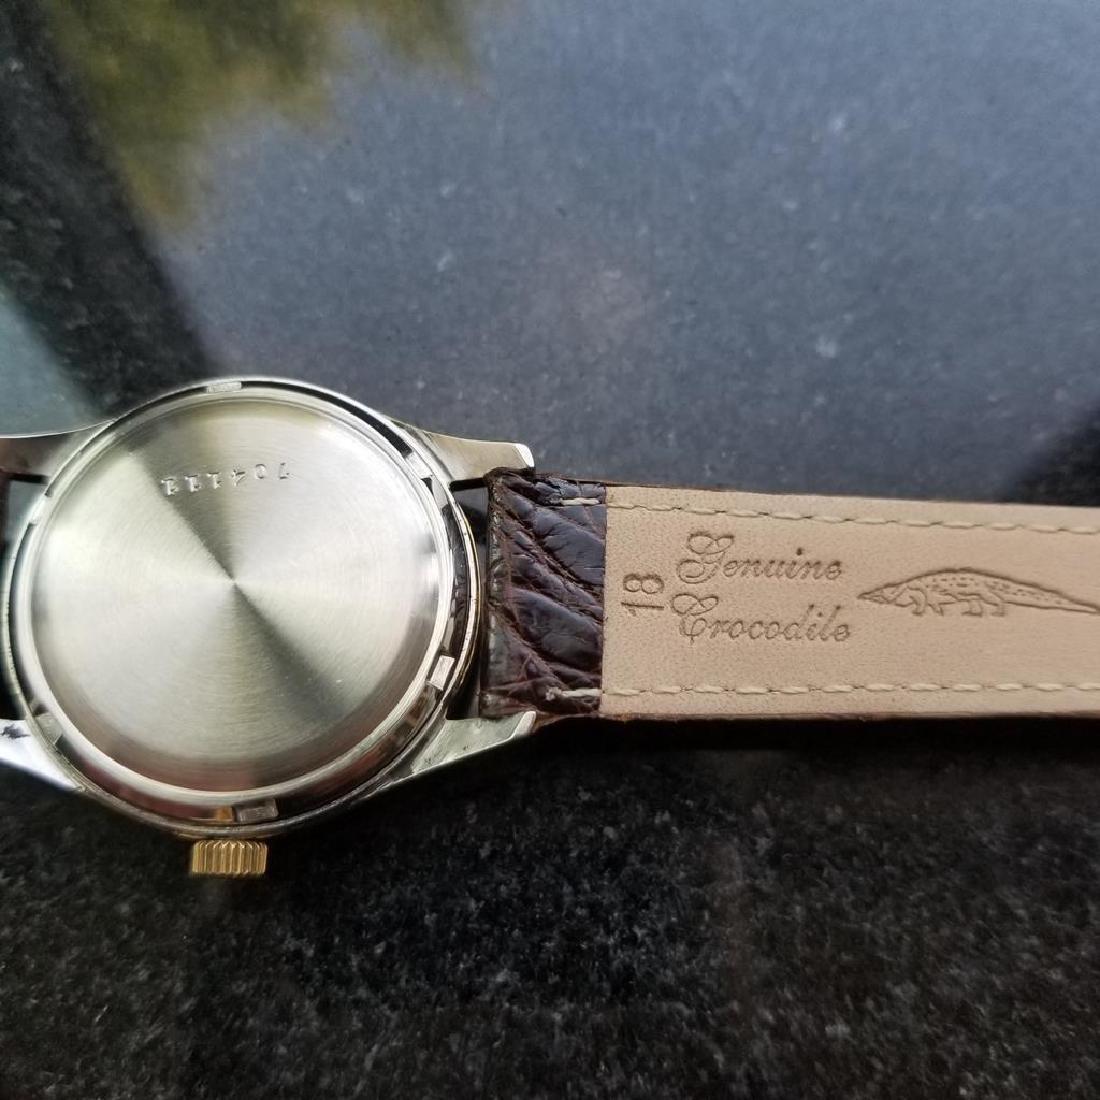 Vintage ULYSSE NARDIN Chronometer Automatic w/ date - 8